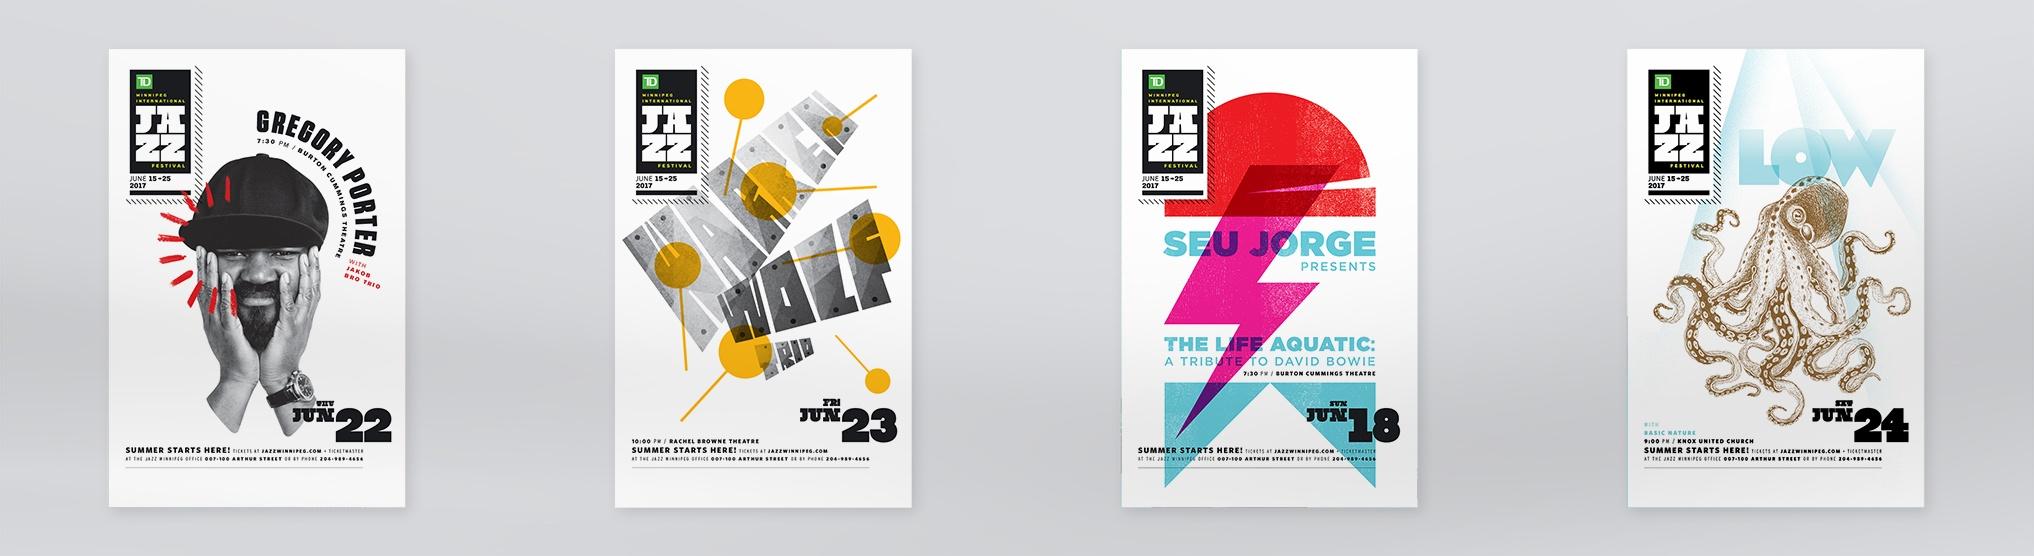 International Winnipeg Jazz Festival poster